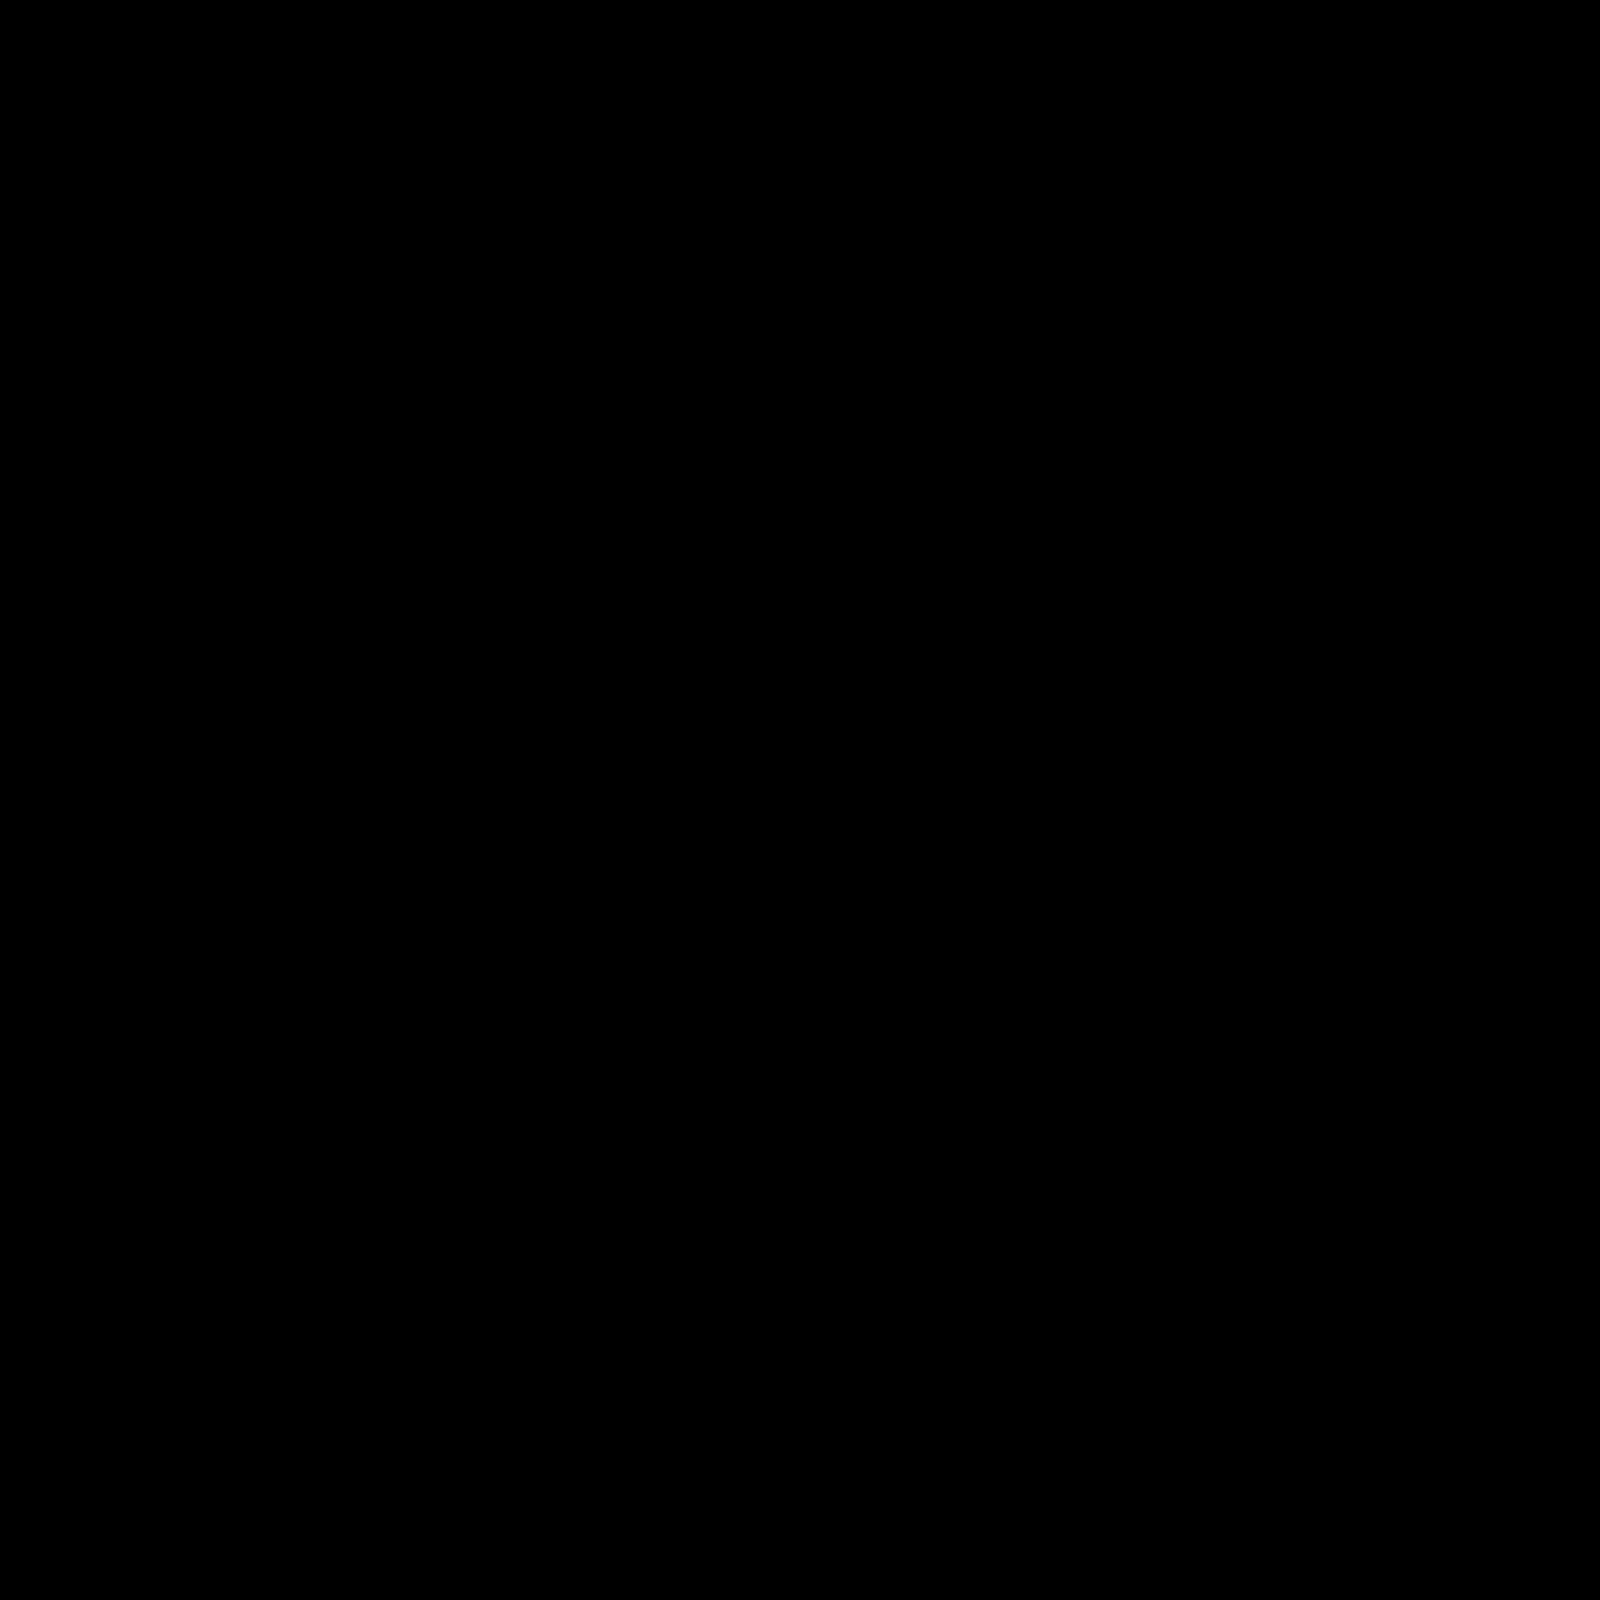 Codedatei icon